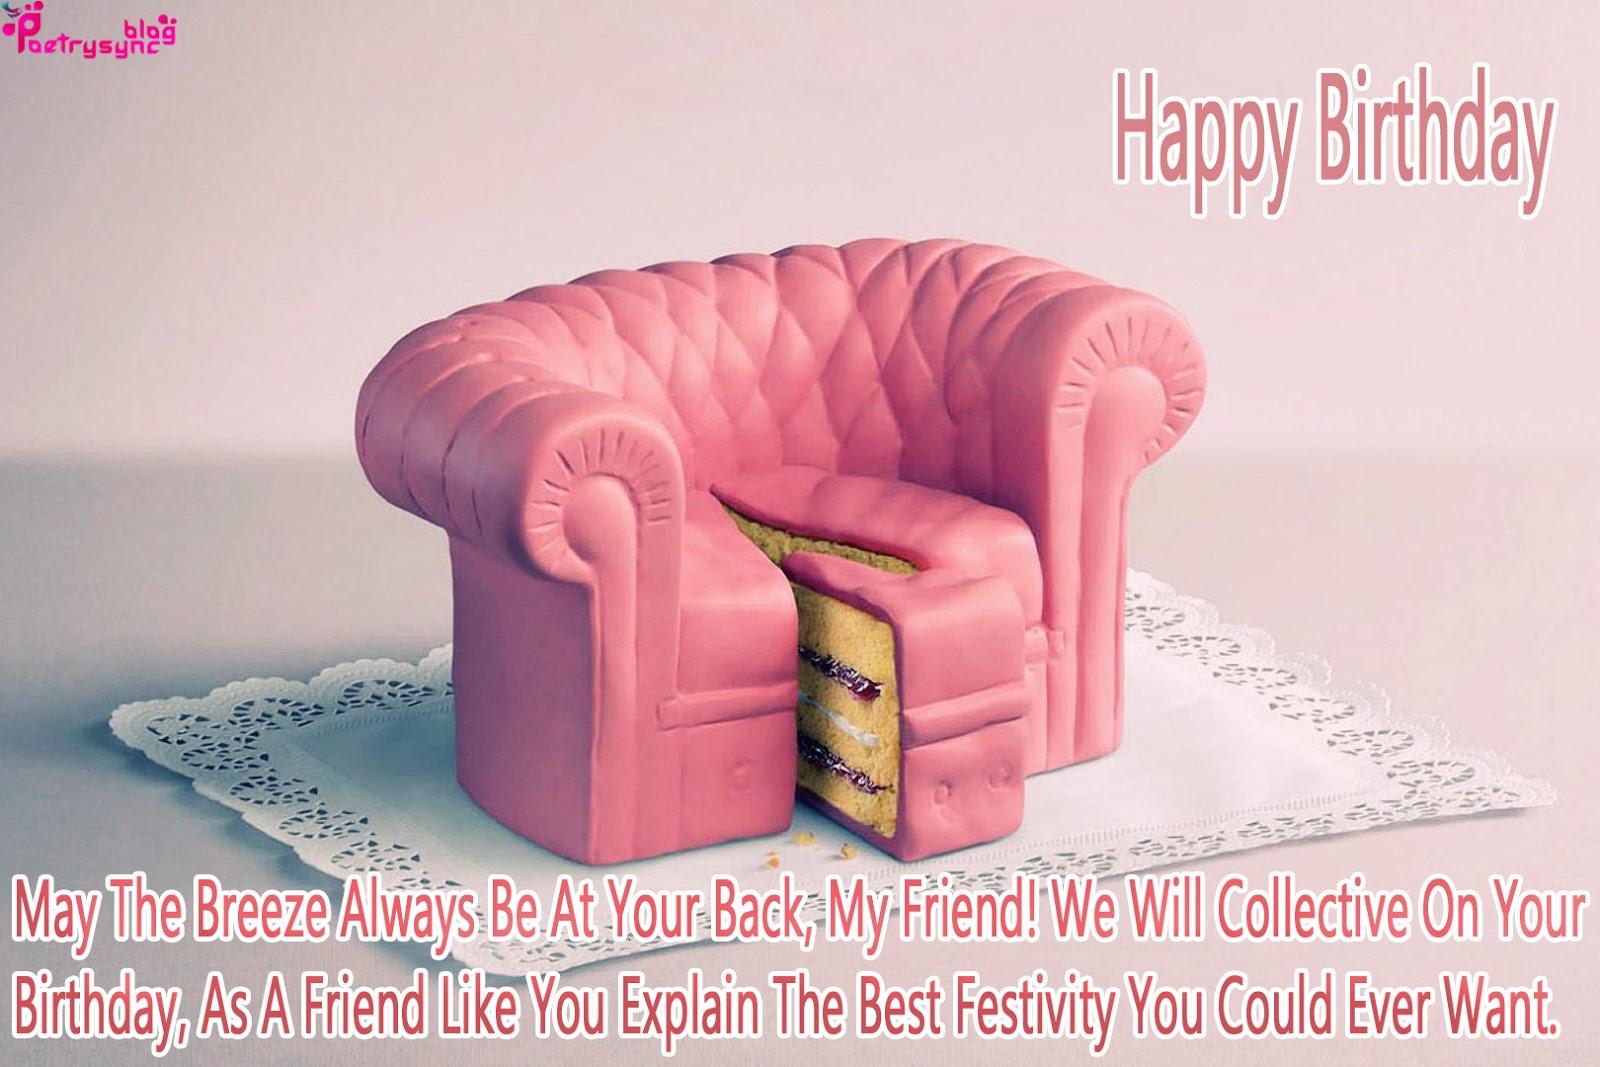 Birthday Cake Images N Quotes ~ Happy birthday cake images with birthday quotes for best friend